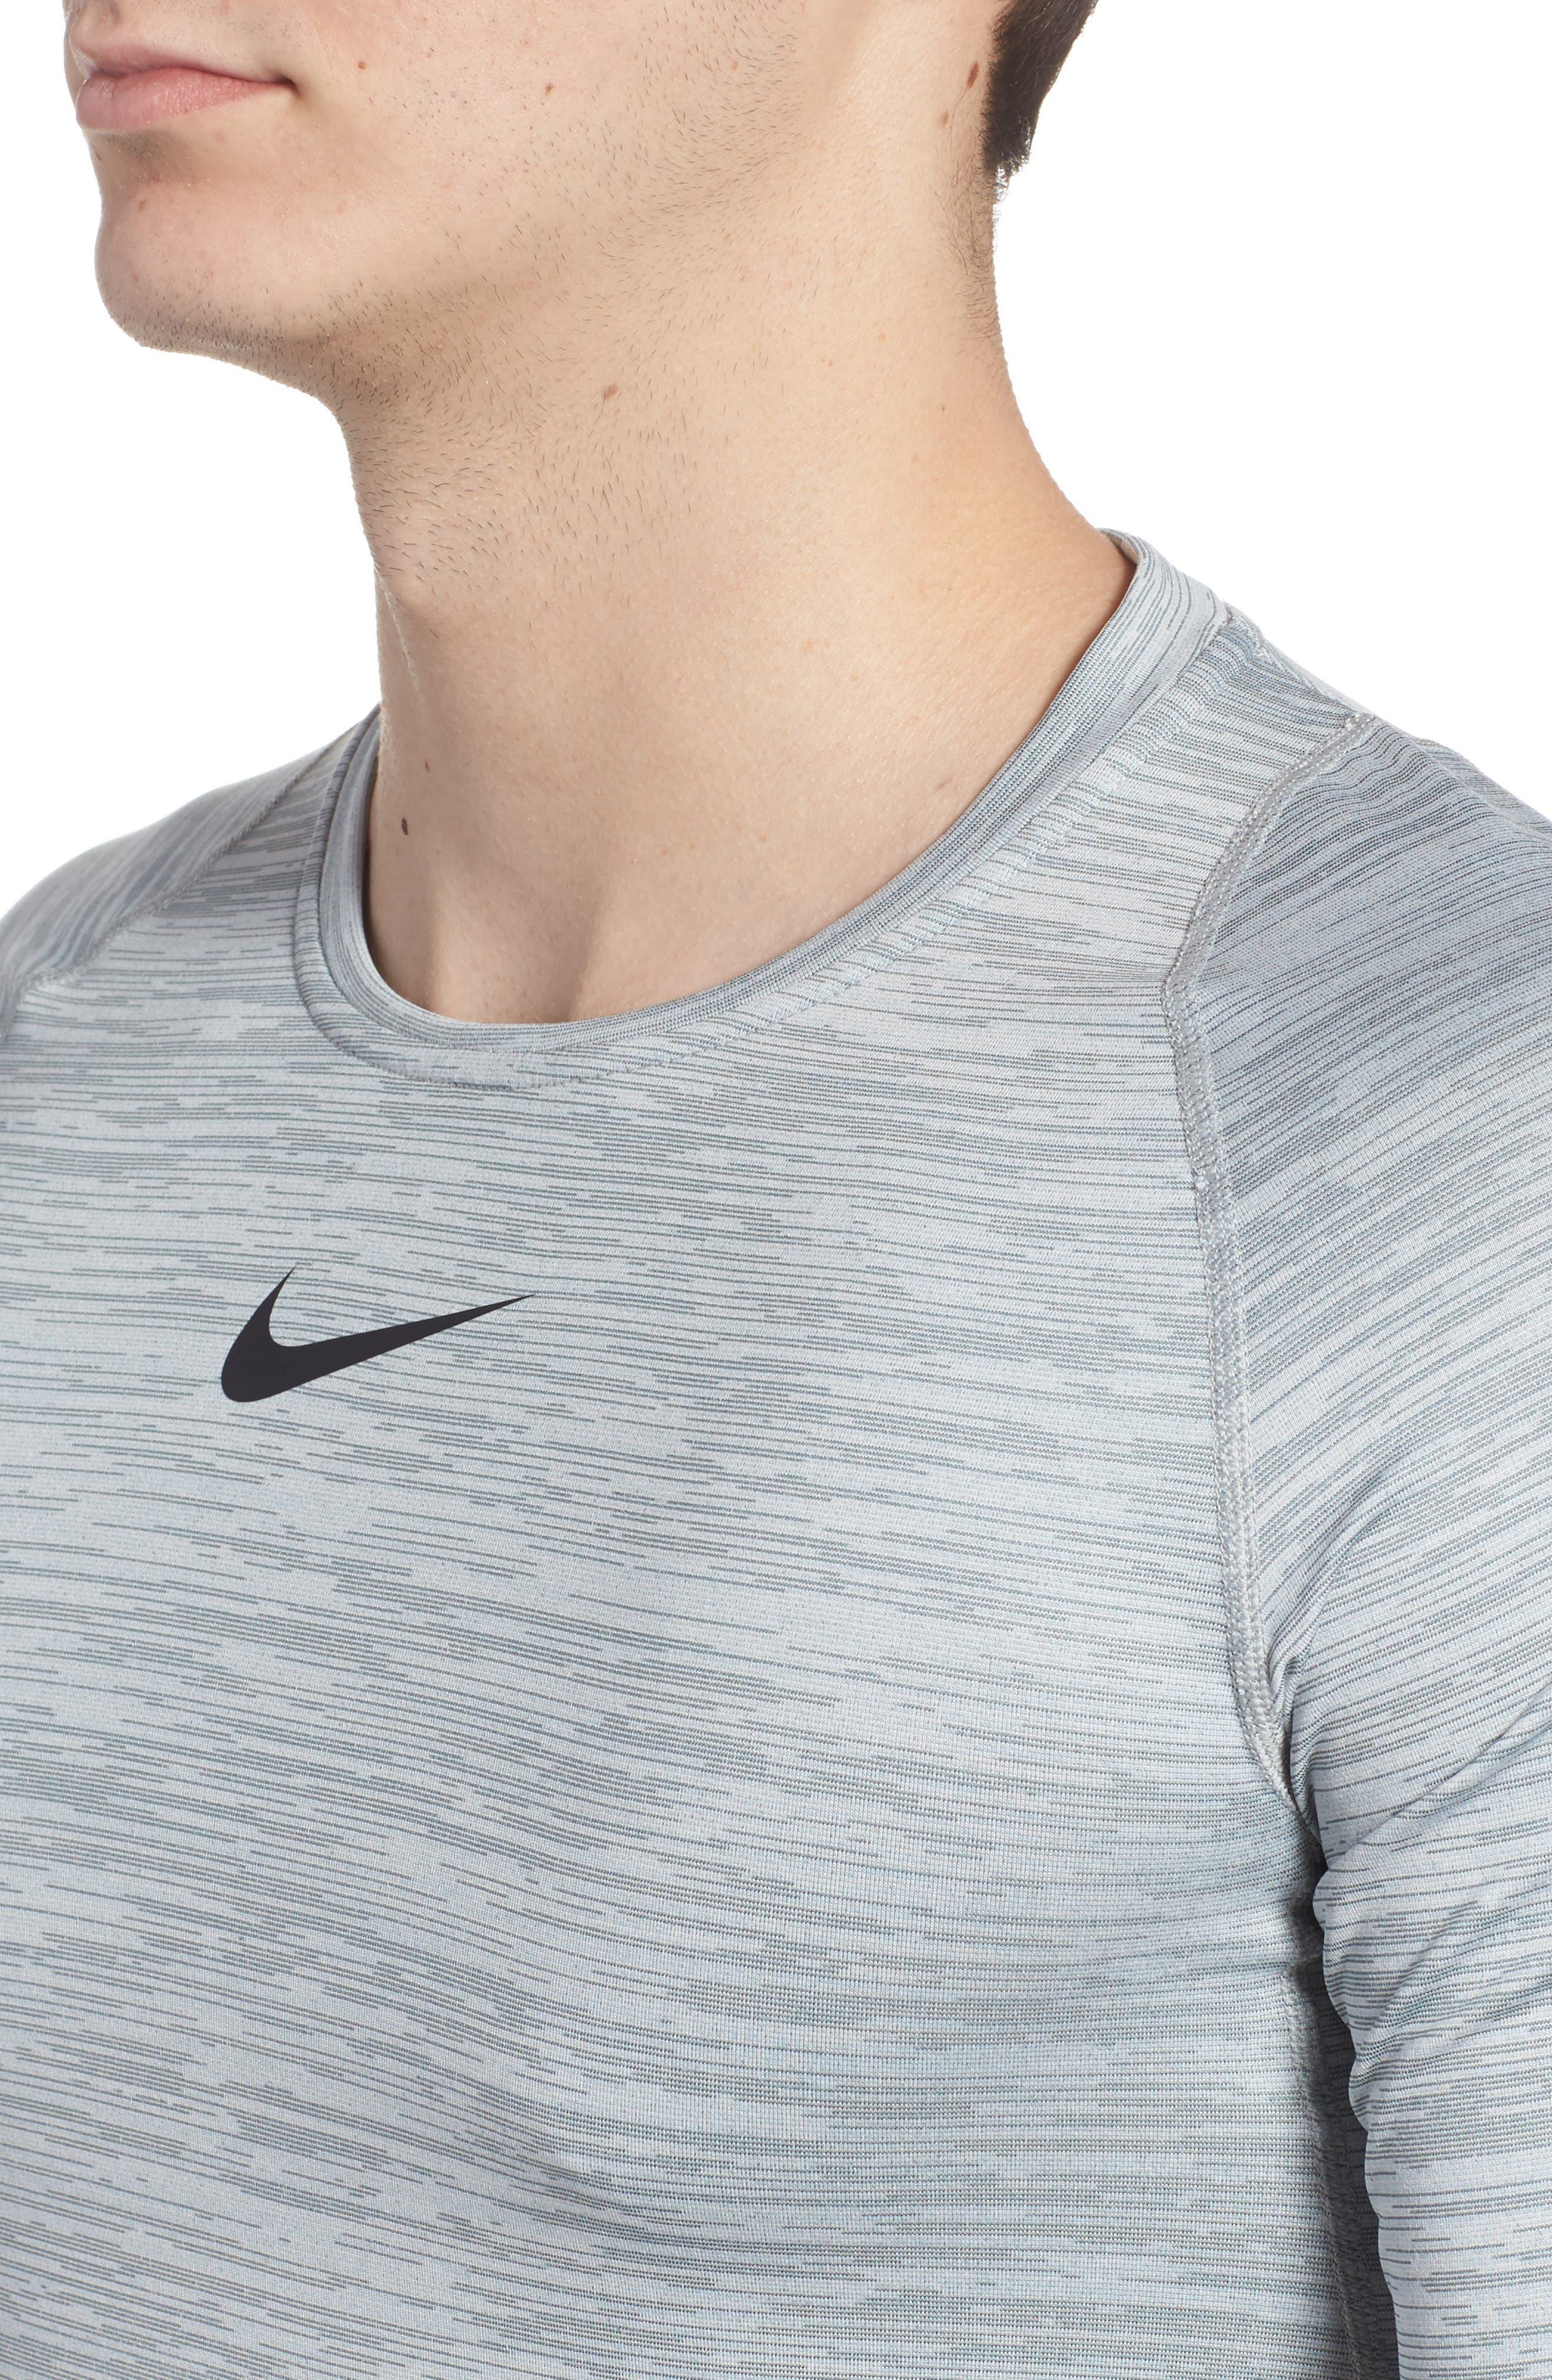 Training Top Crewneck T-Shirt,                             Alternate thumbnail 4, color,                             Cool Grey/ White/ Black